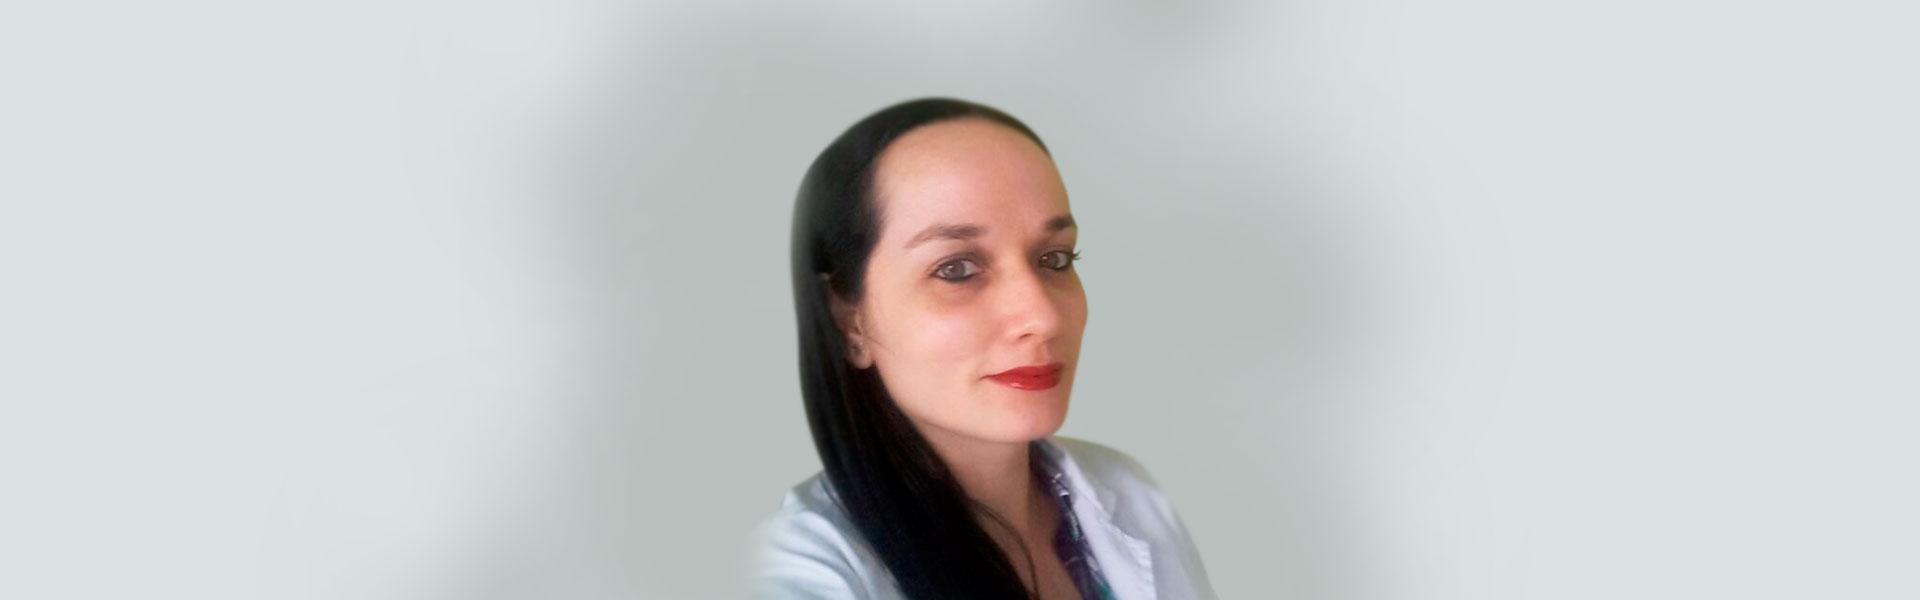 Silvia Jimenez